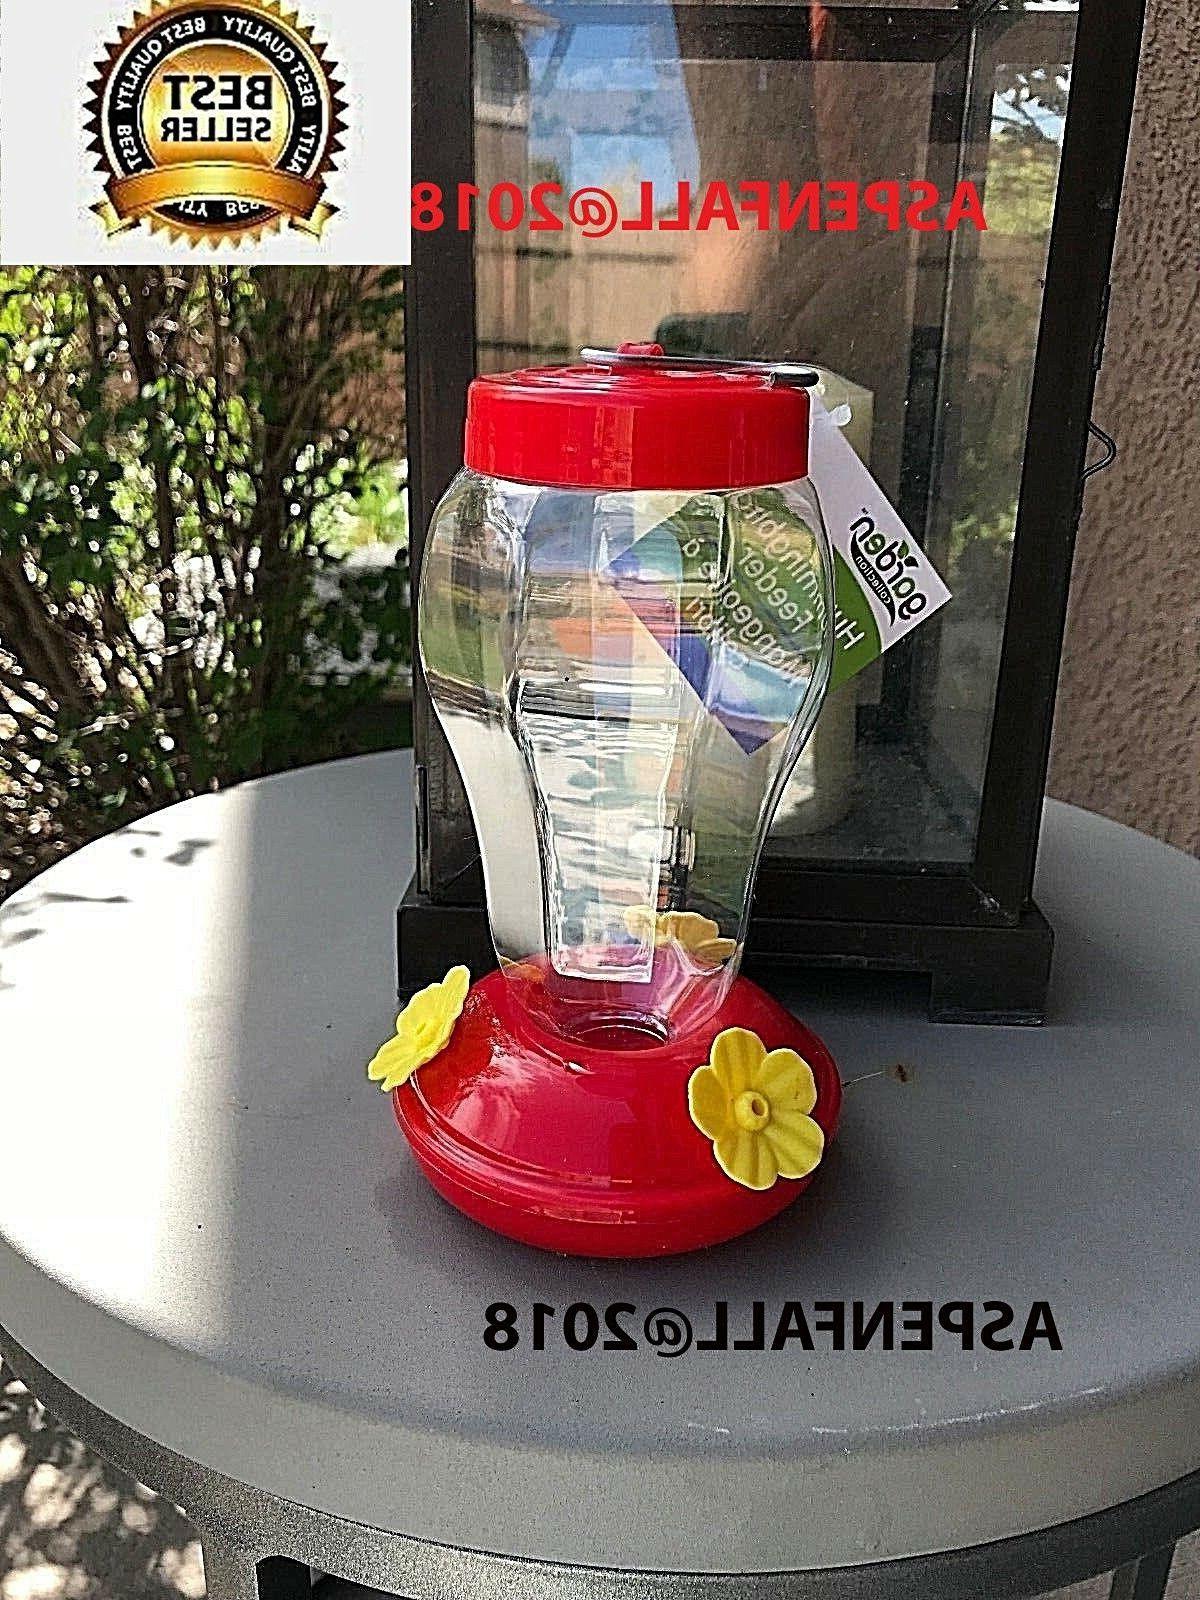 on sale durable plastic hanging hummingbird feeders